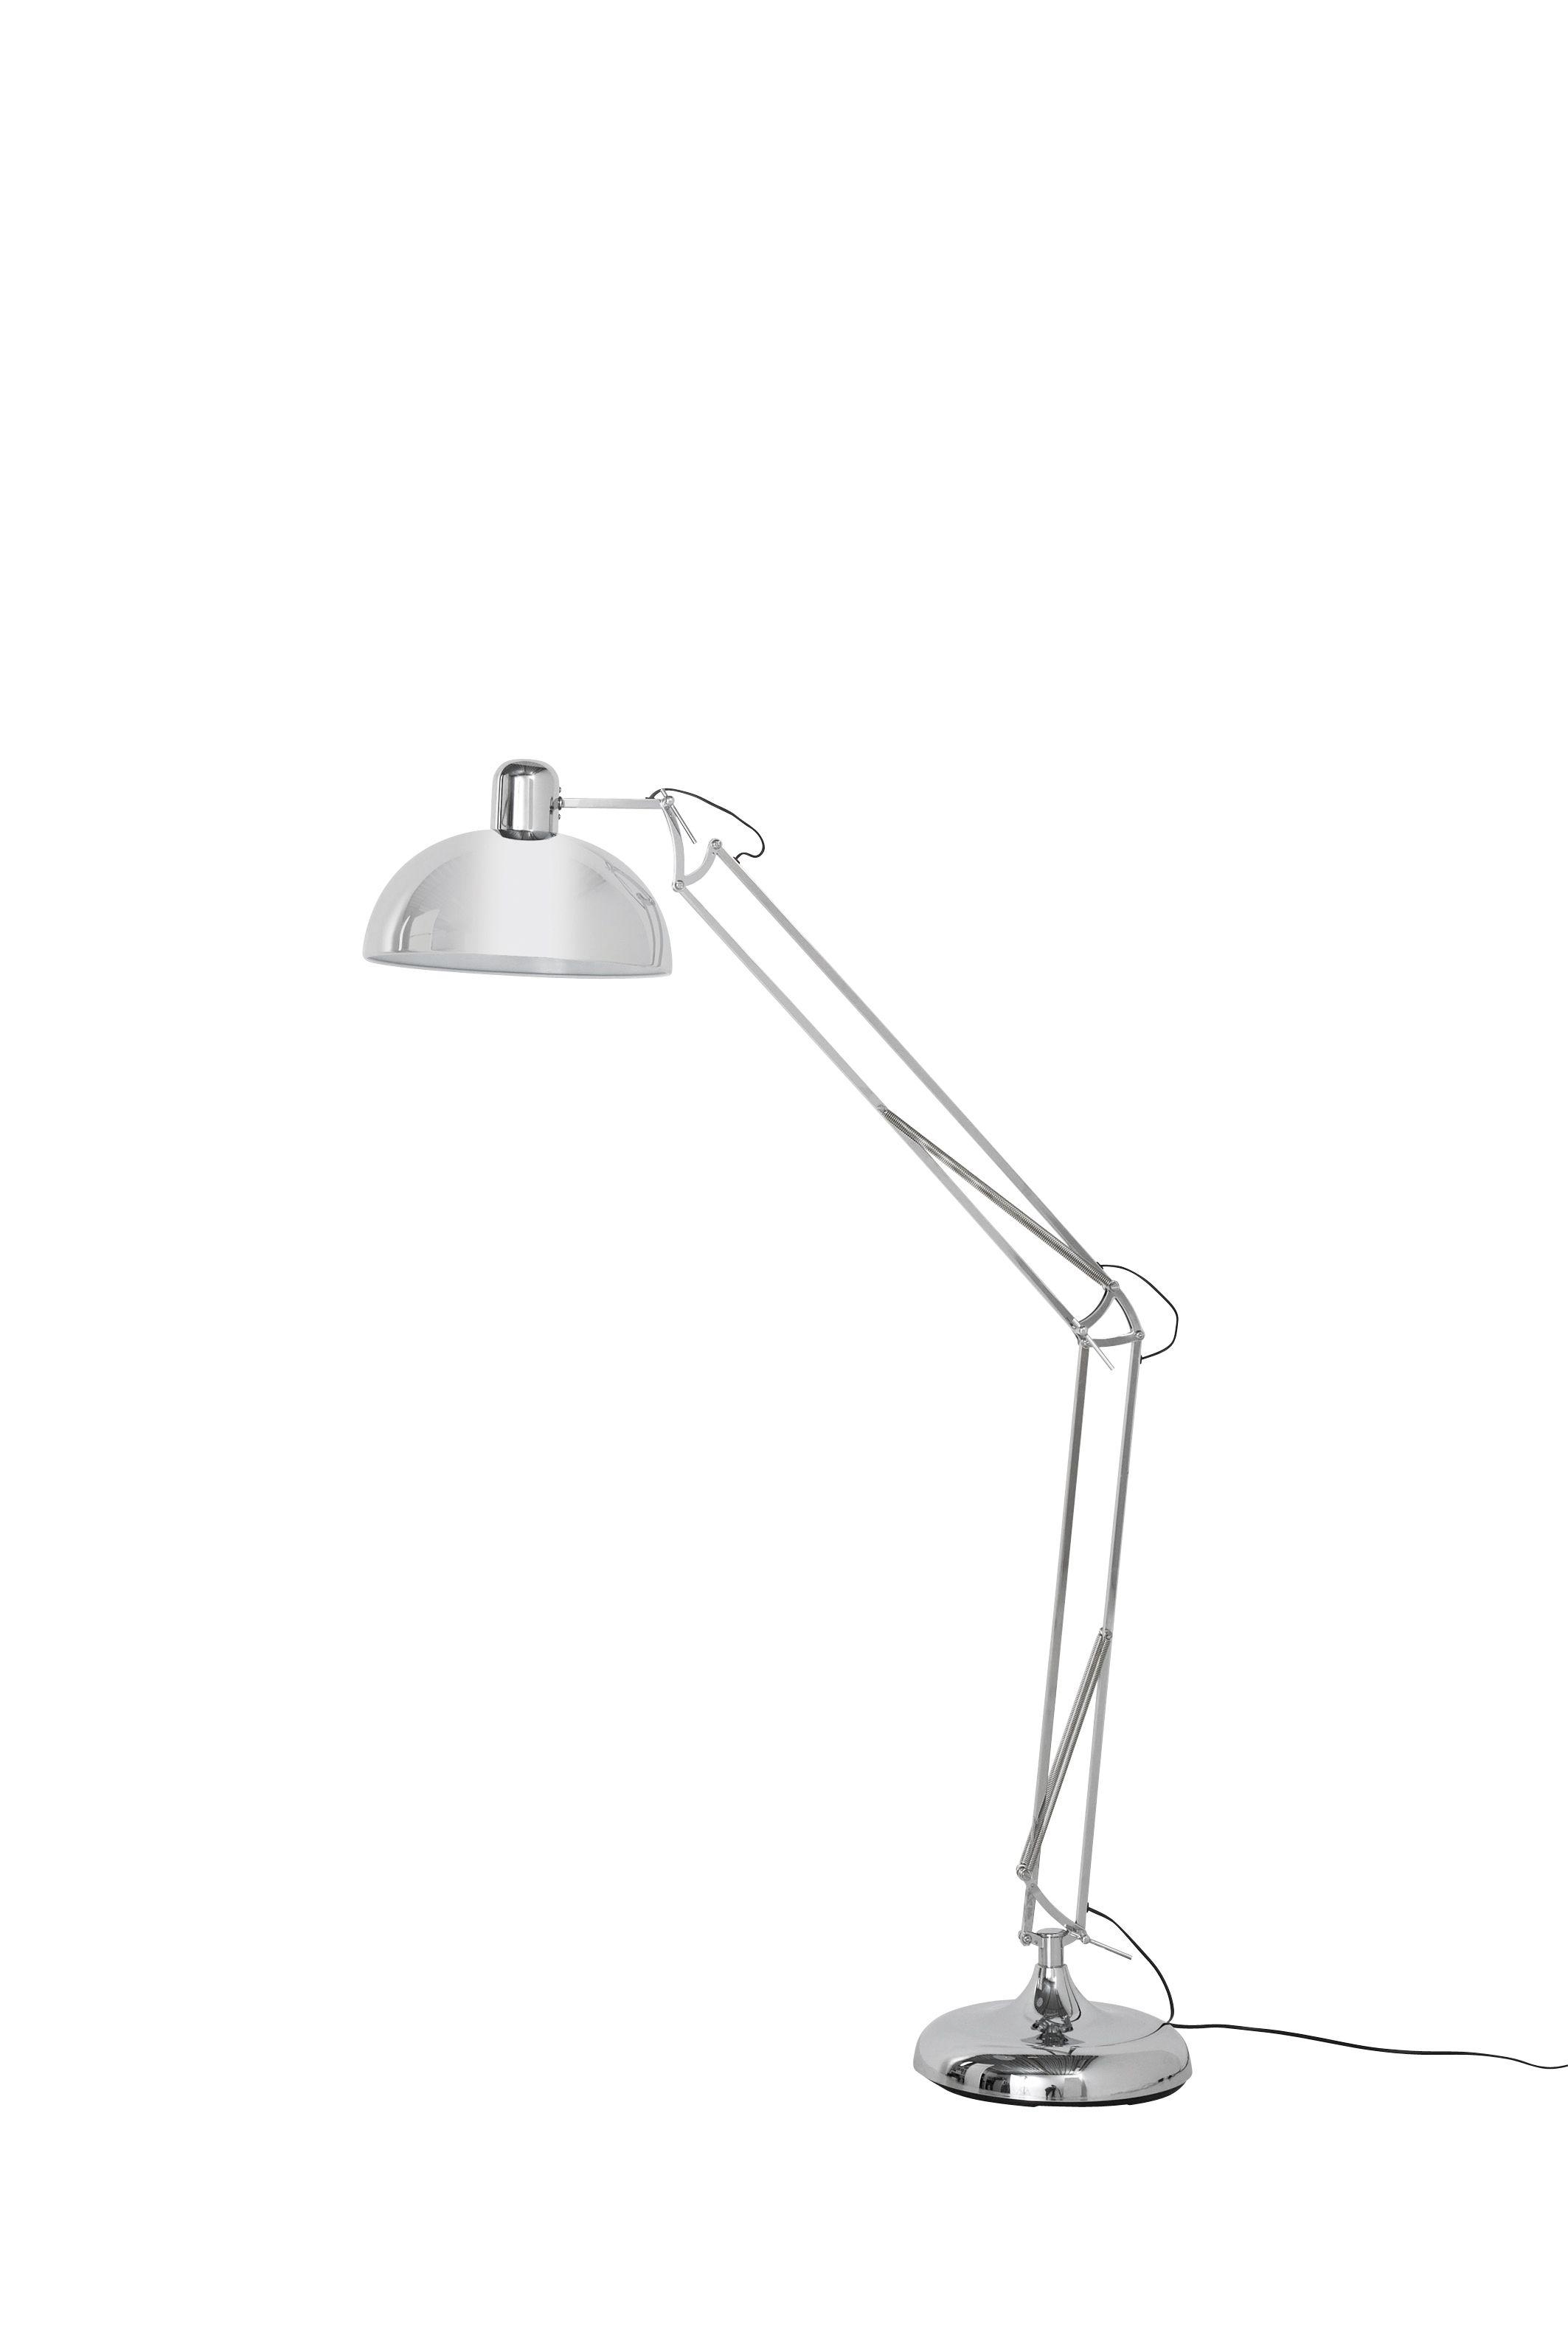 kare design klassische stehlampe office chrome in gigantischen ausma en dekorativ flexibel und. Black Bedroom Furniture Sets. Home Design Ideas